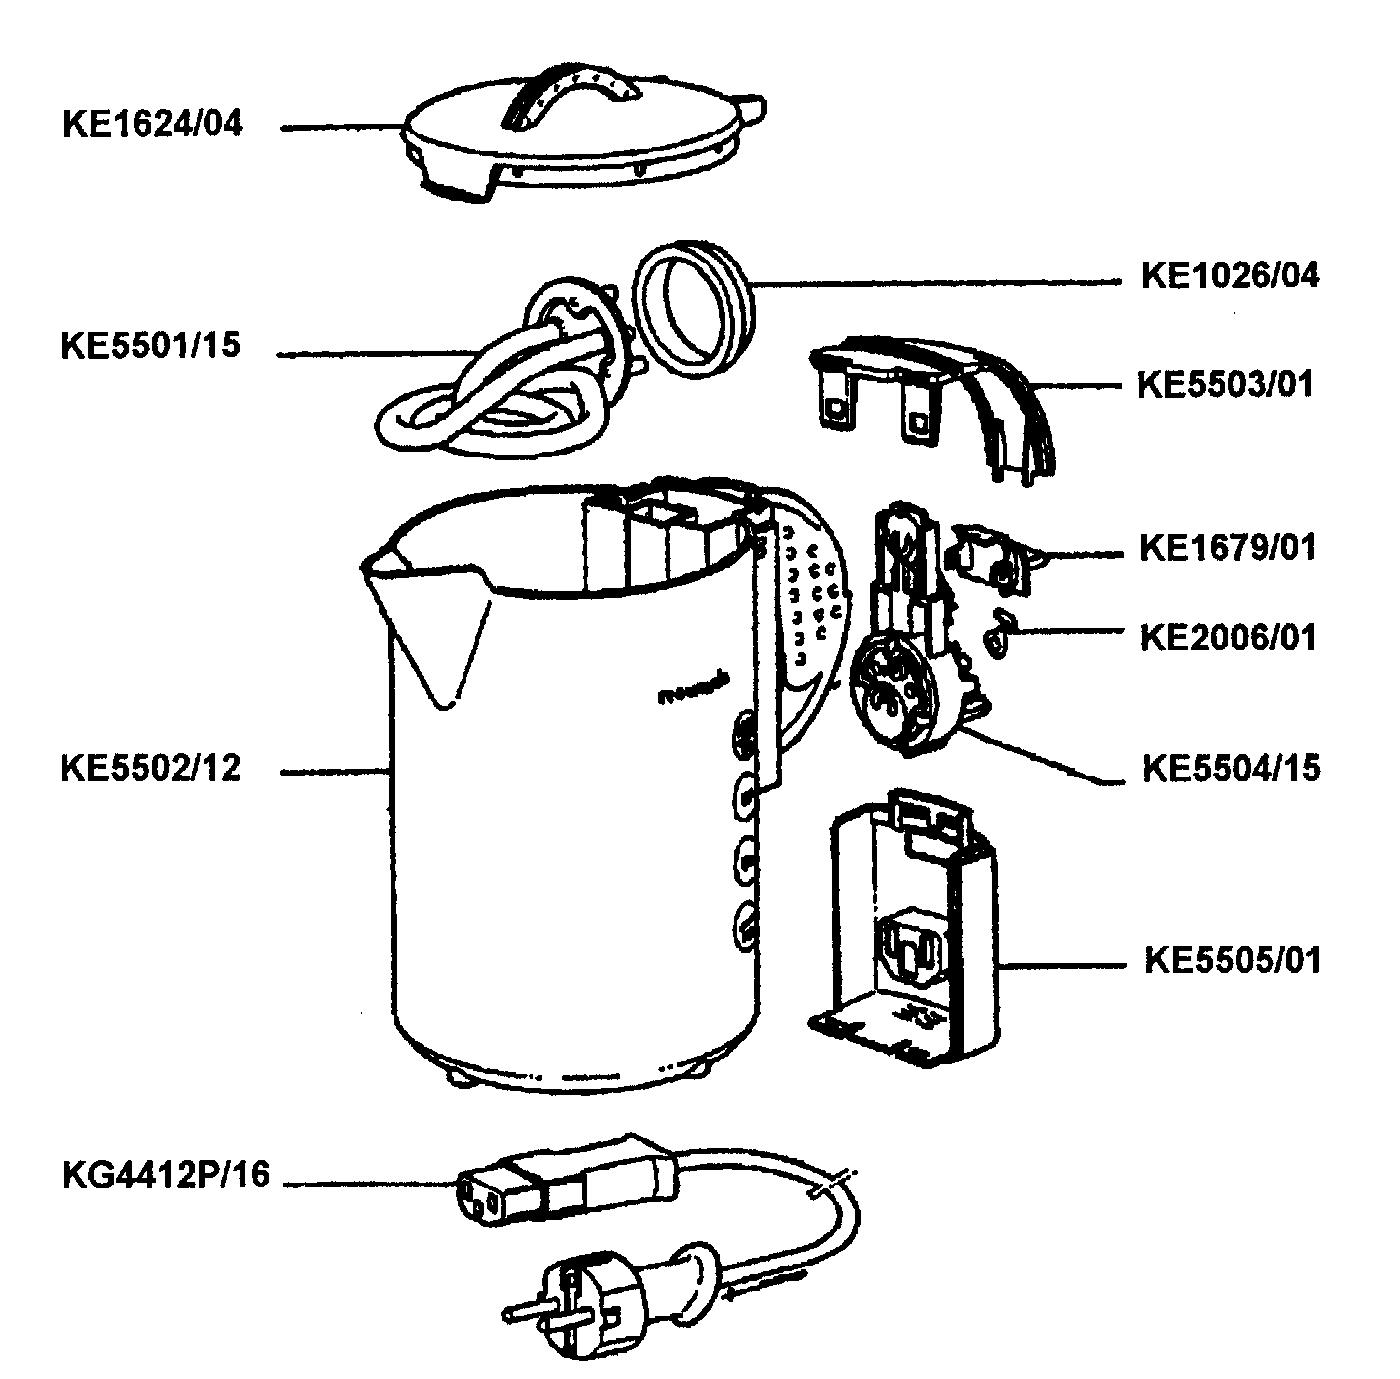 [GO_0831] Diagram Of A Kettle Wiring Diagram